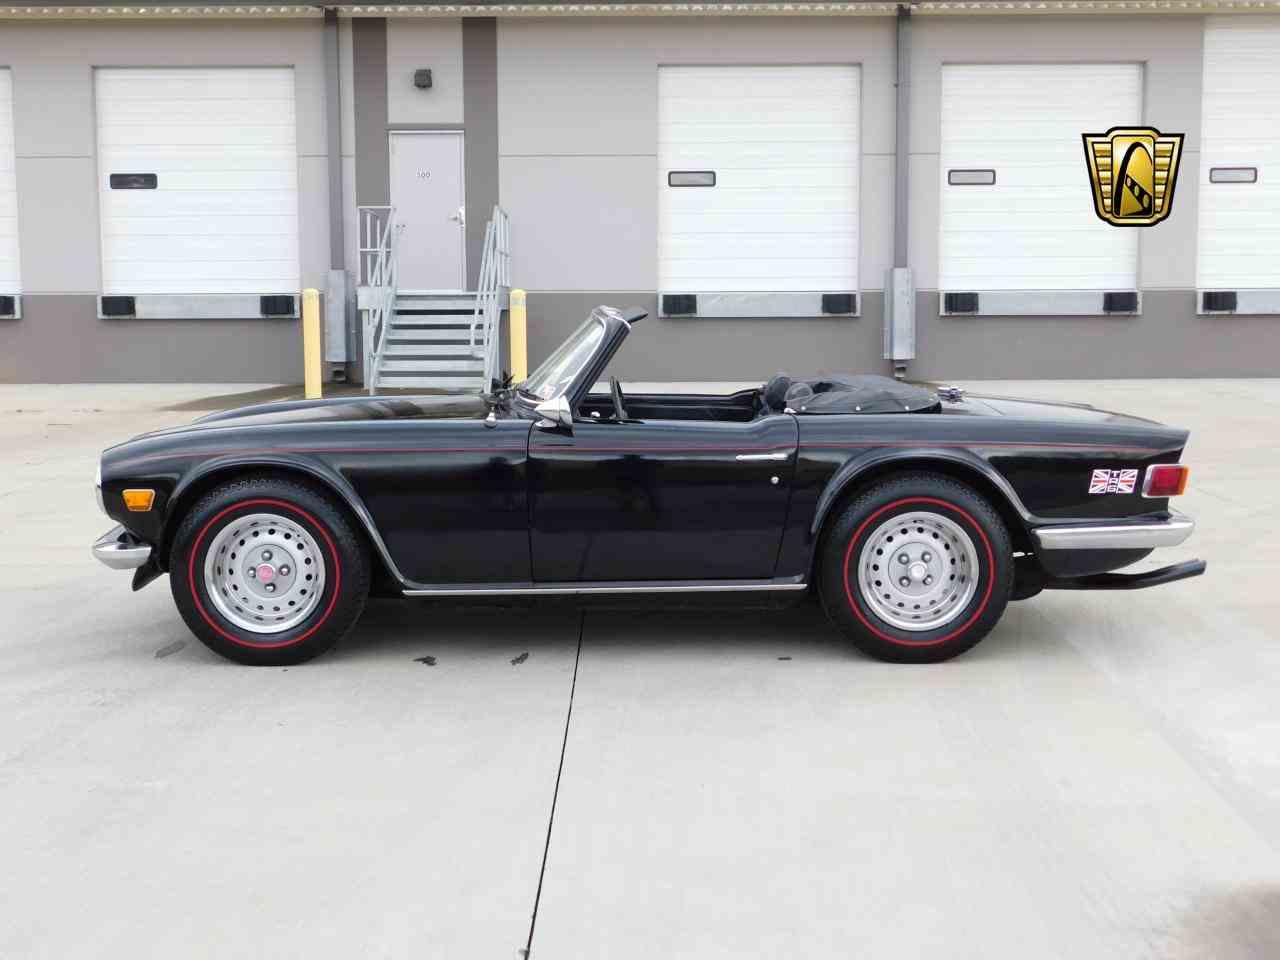 1974 Triumph TR6 for Sale | ClassicCars.com | CC-1068686